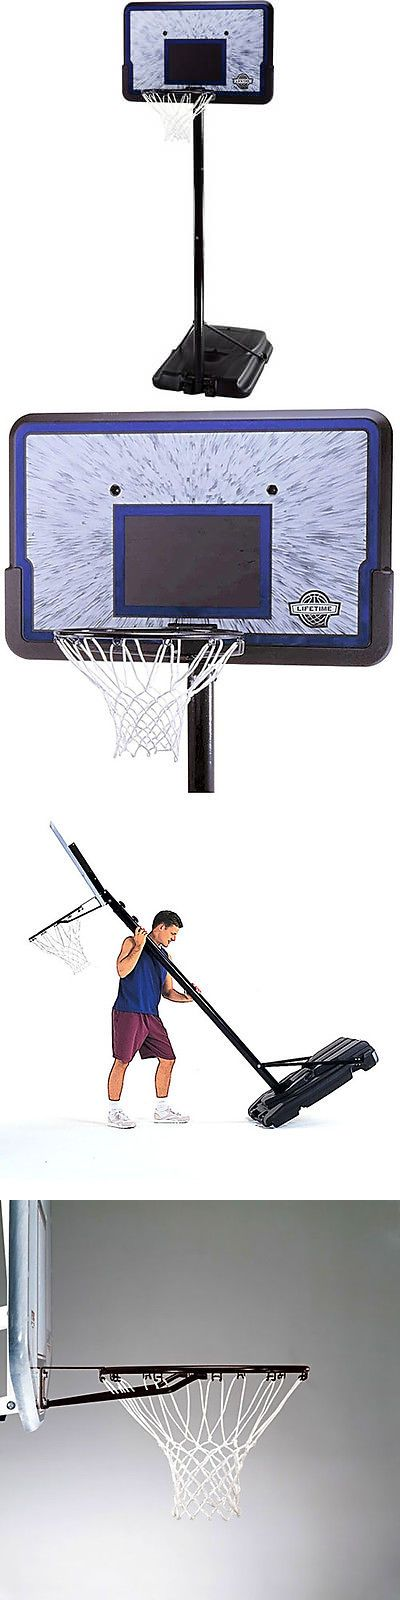 Backboard Systems 21196: New! Lifetime 44 Portable Basketball System Adjustable Hoop Backboard Net Pole -> BUY IT NOW ONLY: $113.09 on eBay!